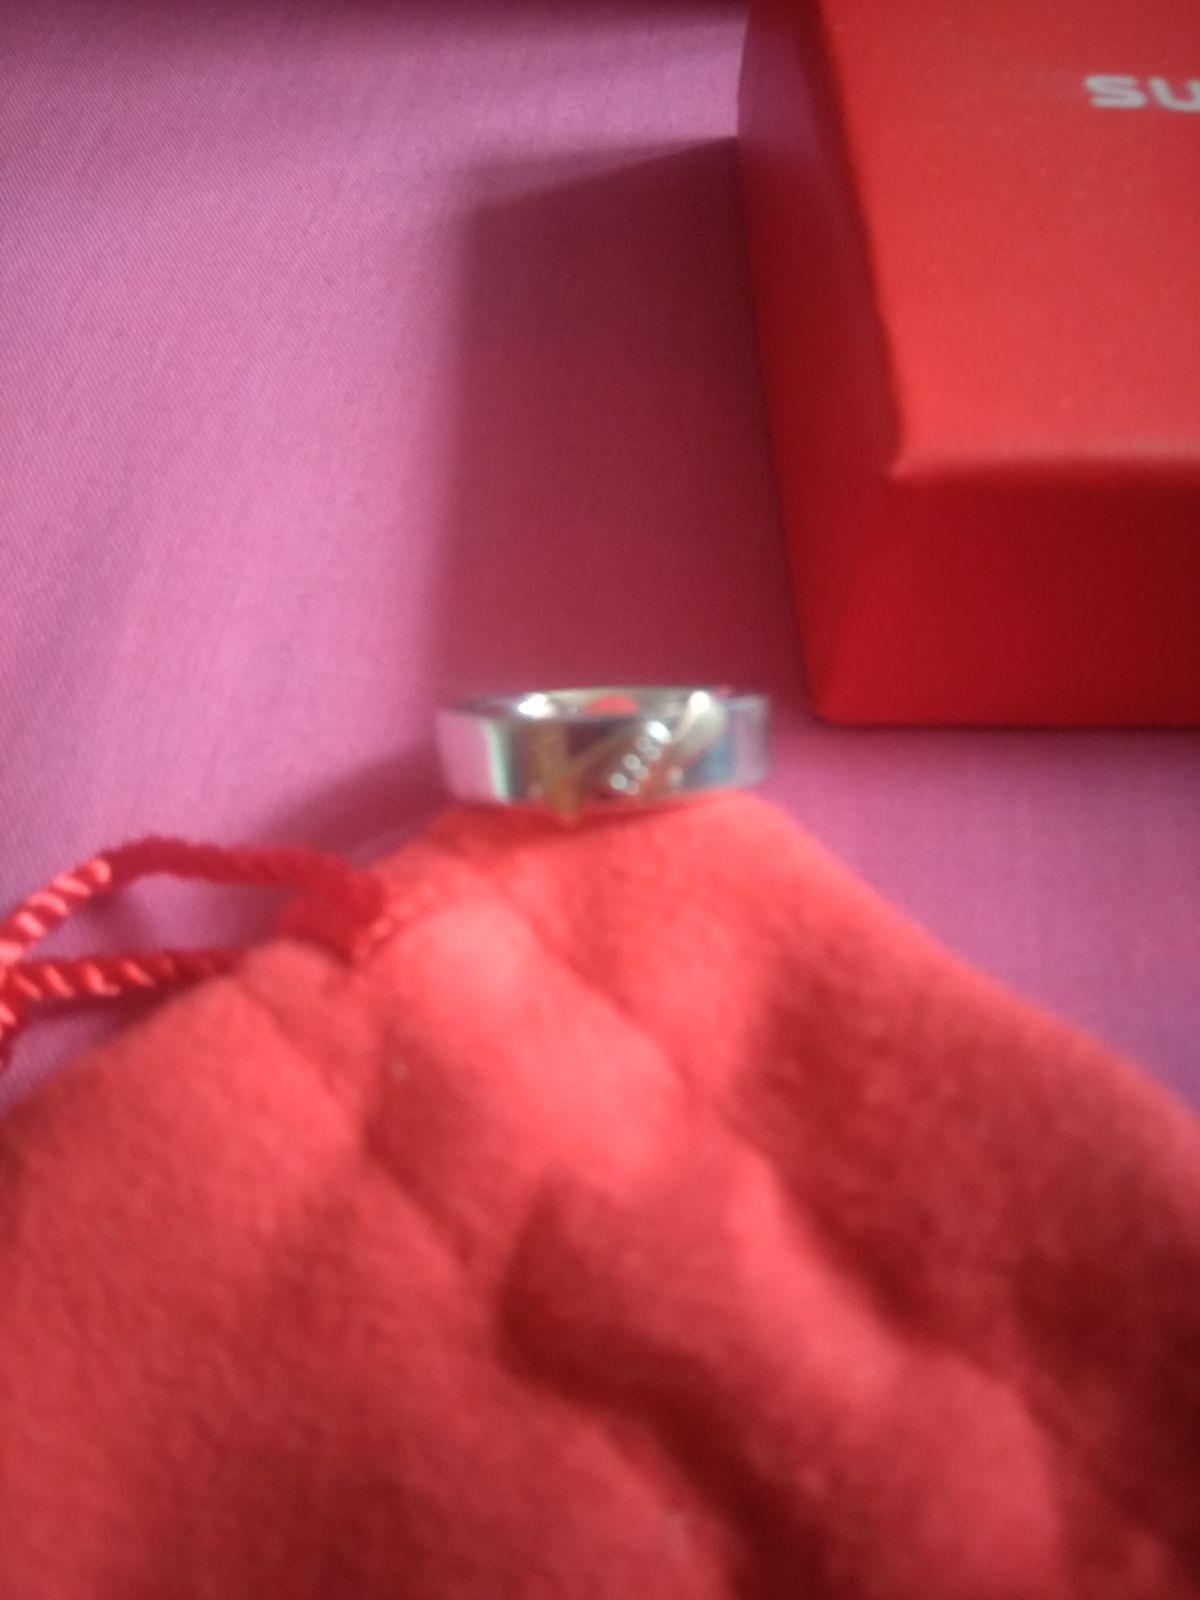 Серебро с золотом и бриллиантами